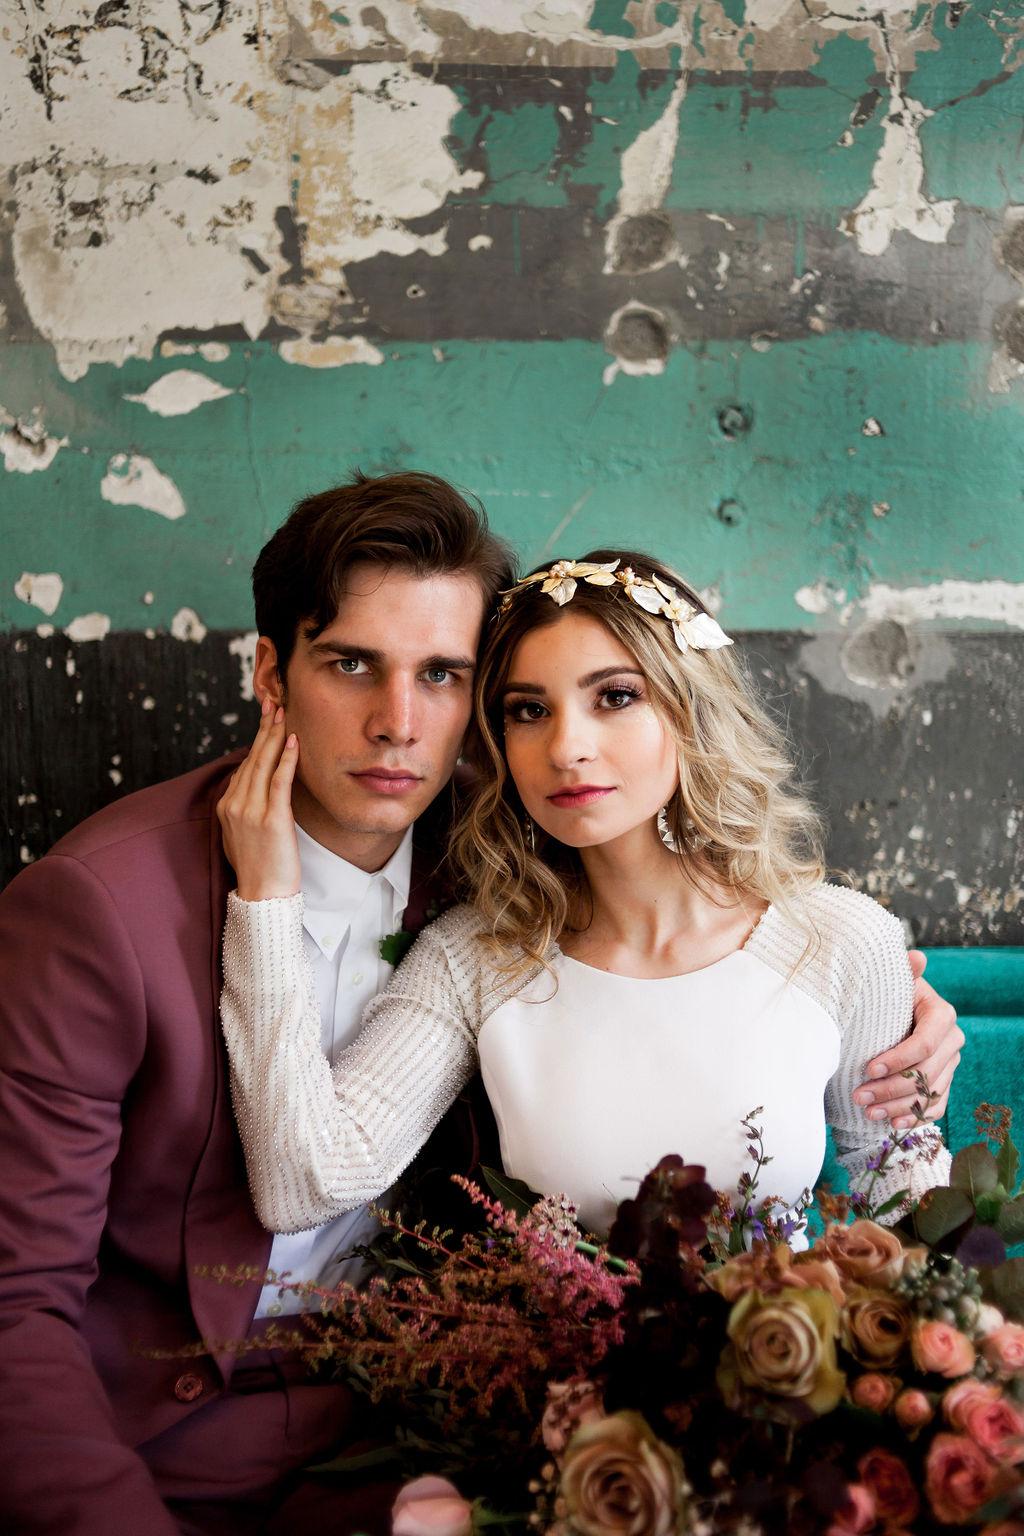 pittsburgh_wedding_photographer_liz_capuano-0311copy.jpeg